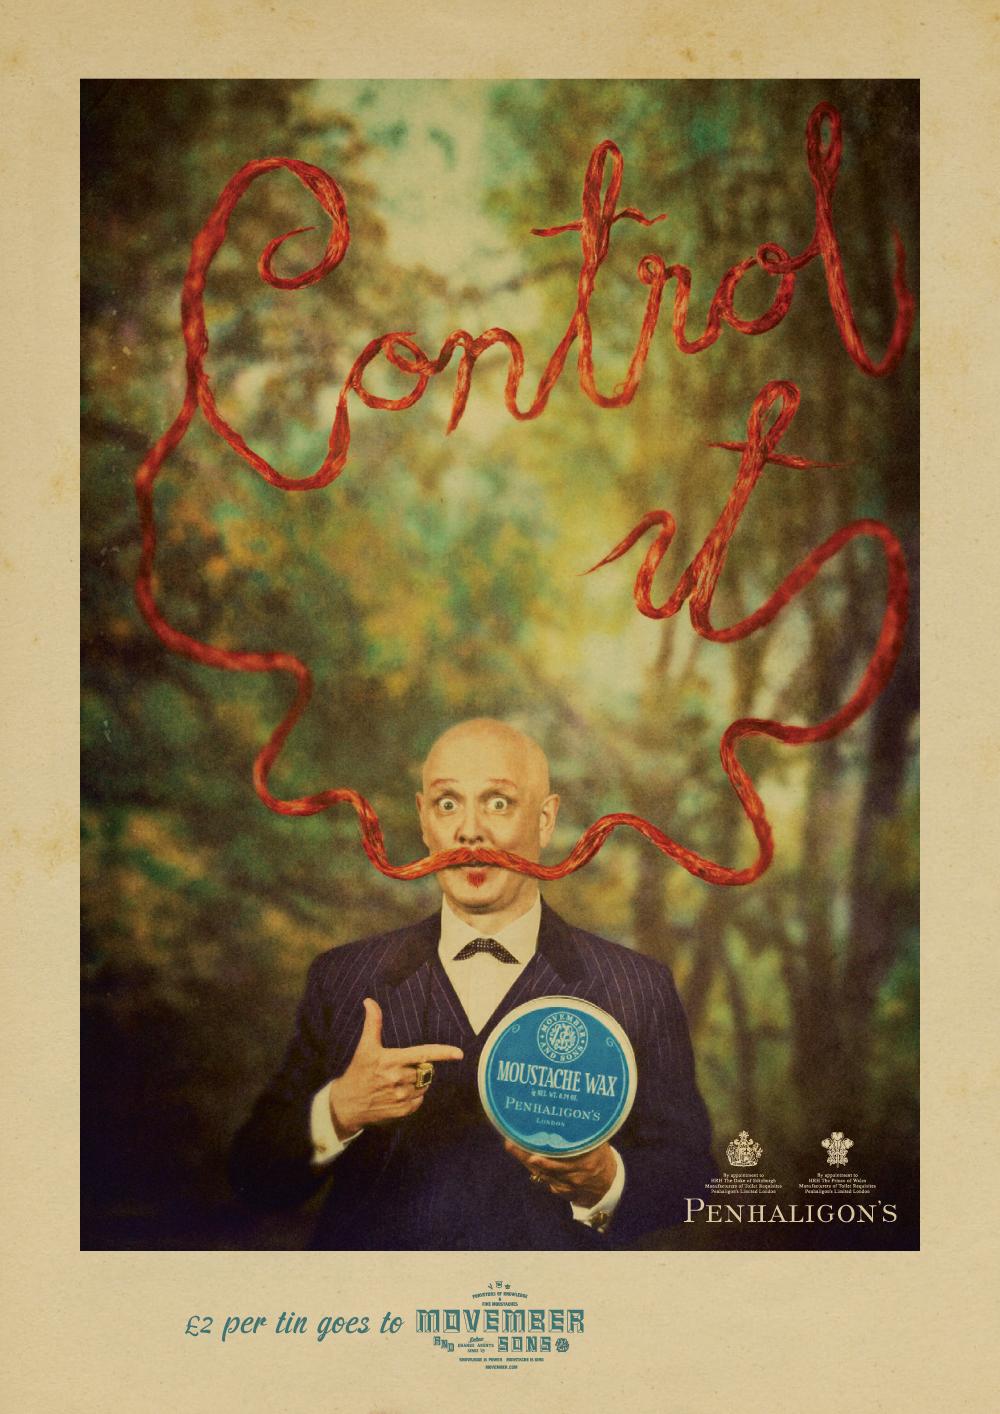 10. 'Control It - Movember' Penhaligon's, DHM.jpg